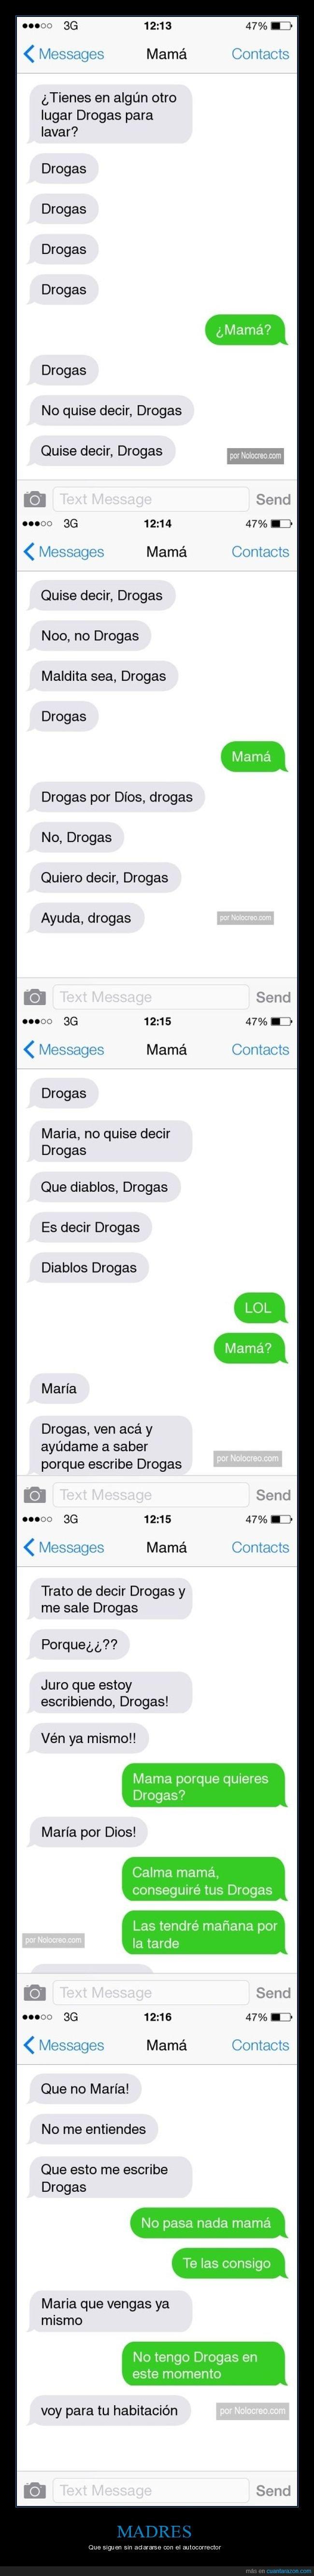 autocorrector,drogas,madre,whatsapp